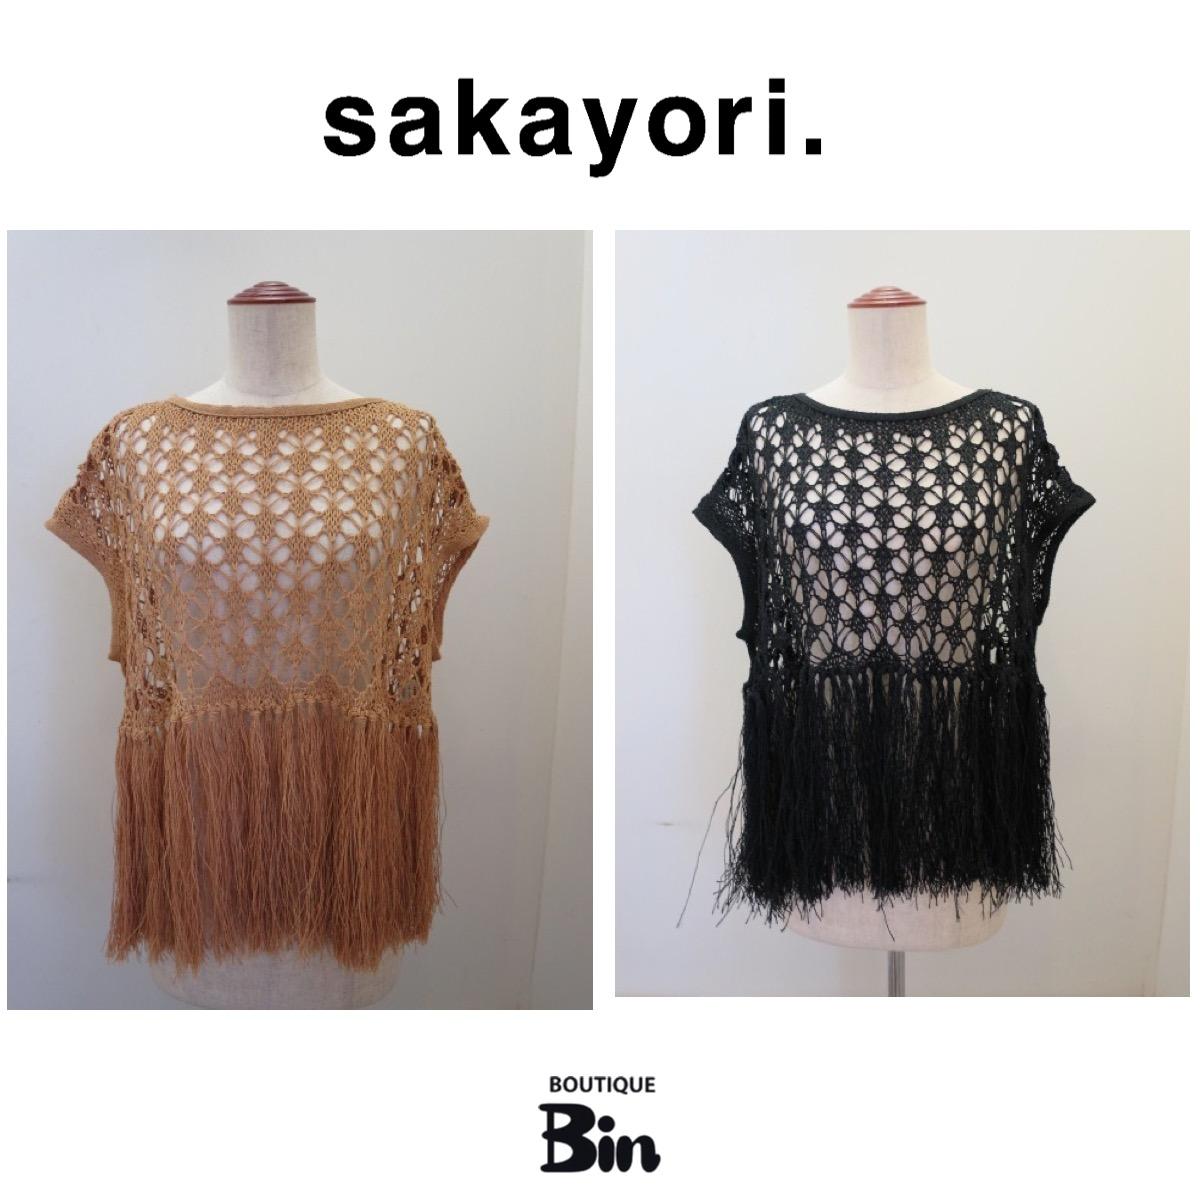 sakayori サカヨリ  フレンチスリーブメッシュ編みプルオーバー:ベージュ/ブラック